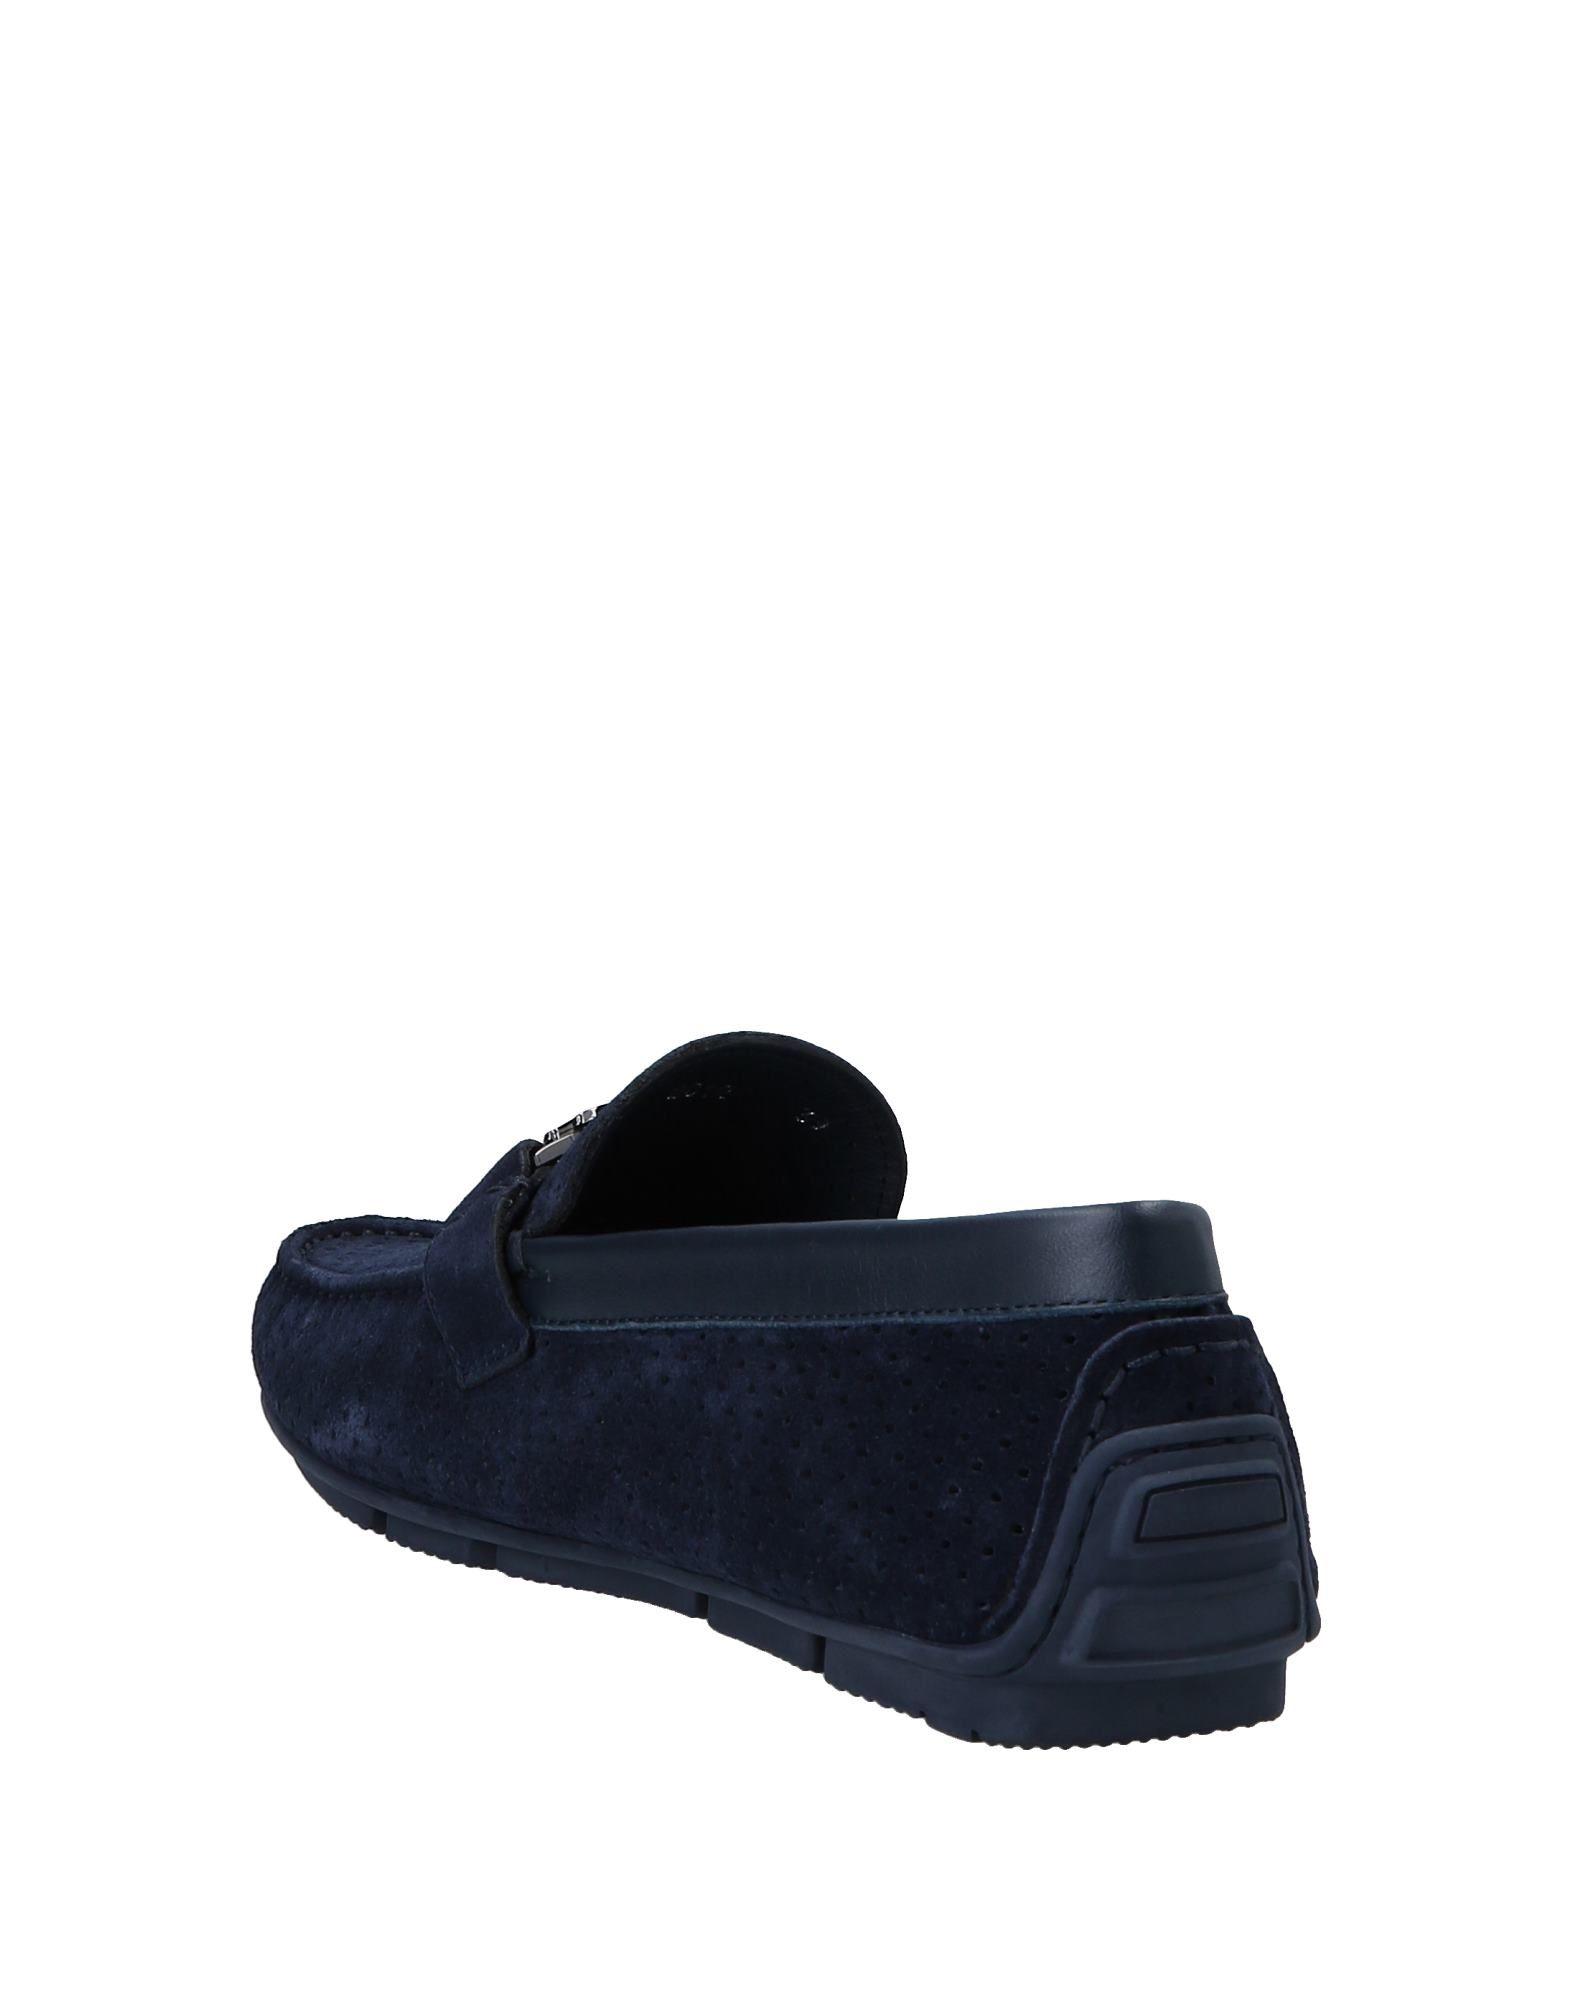 Roberto Cavalli Mokassins Herren  11551409JR Gute Qualität beliebte Schuhe